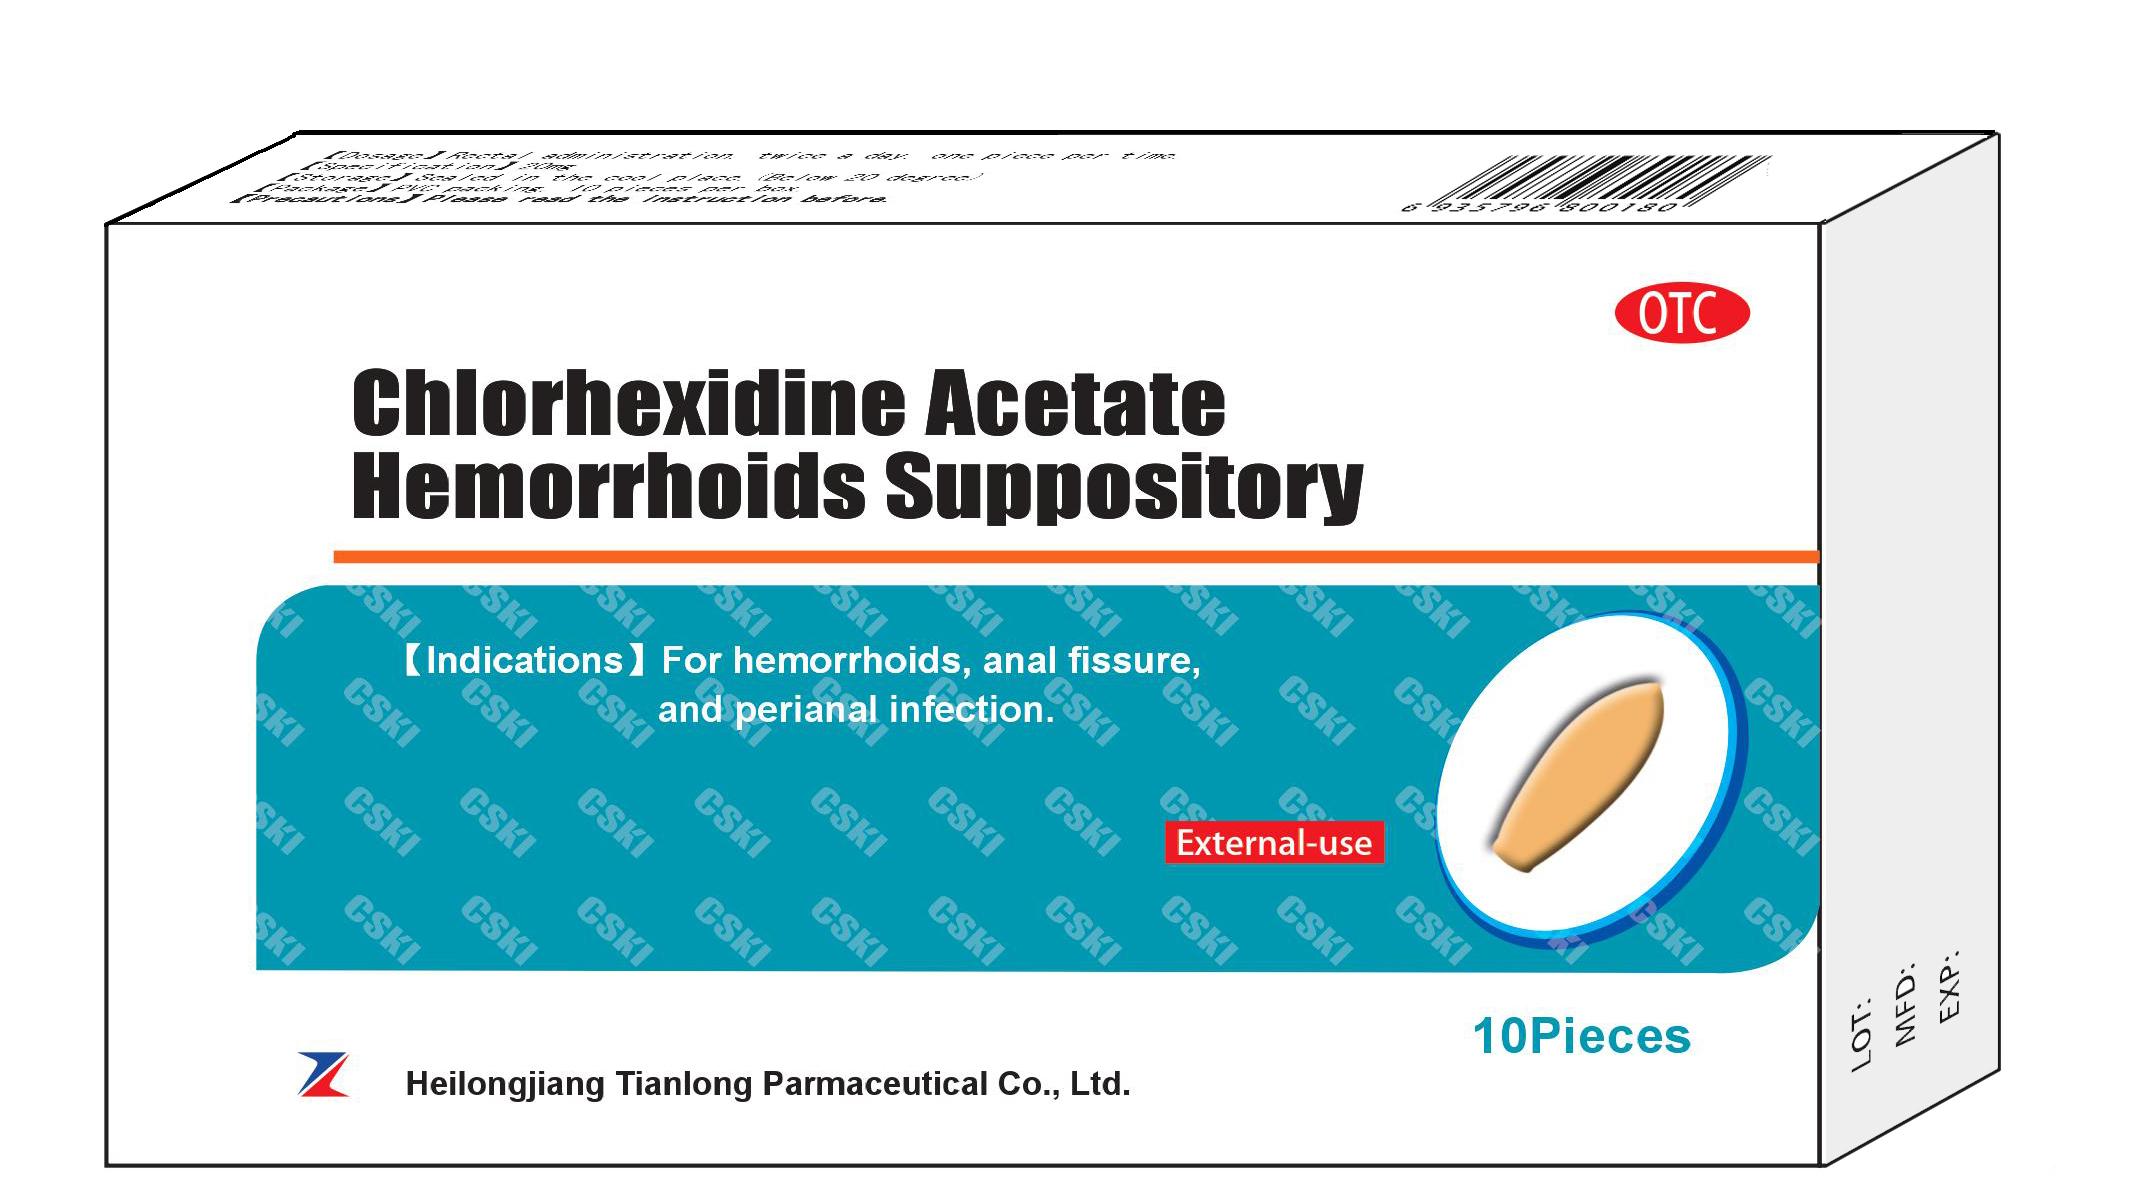 Chlorhexidine Acetate Hemorrhoids